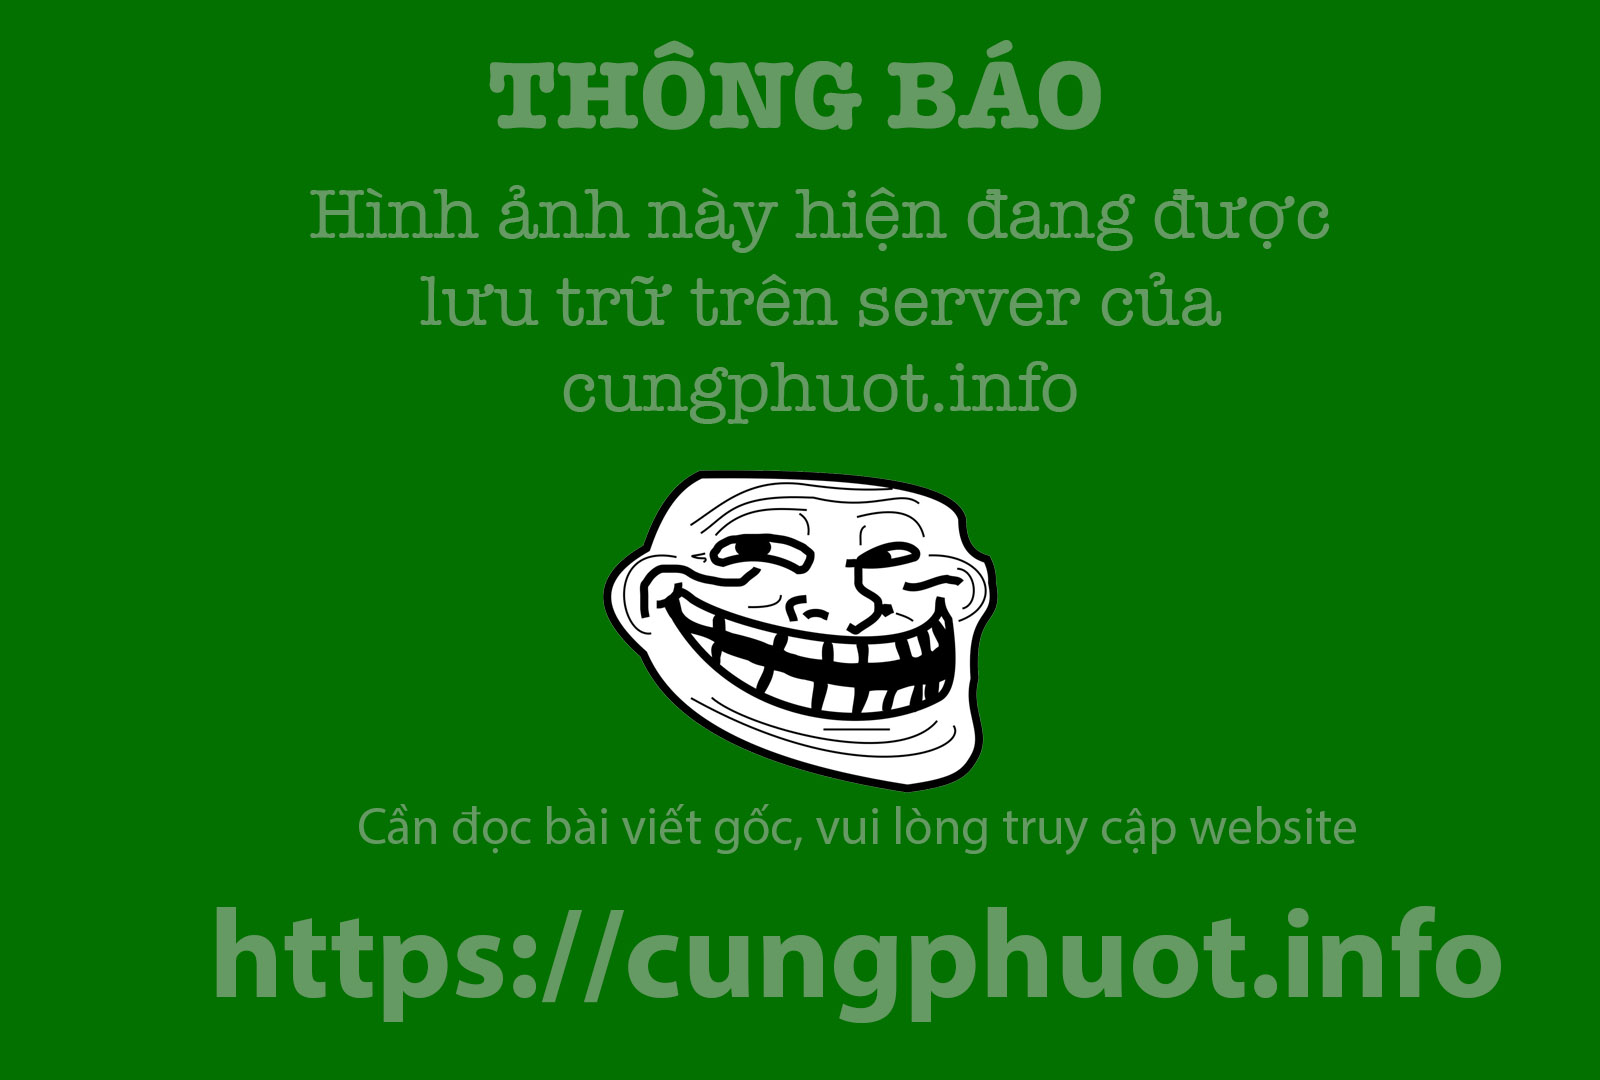 Binh minh tuyet dep tren nhung doi che Tan Cuong hinh anh 5